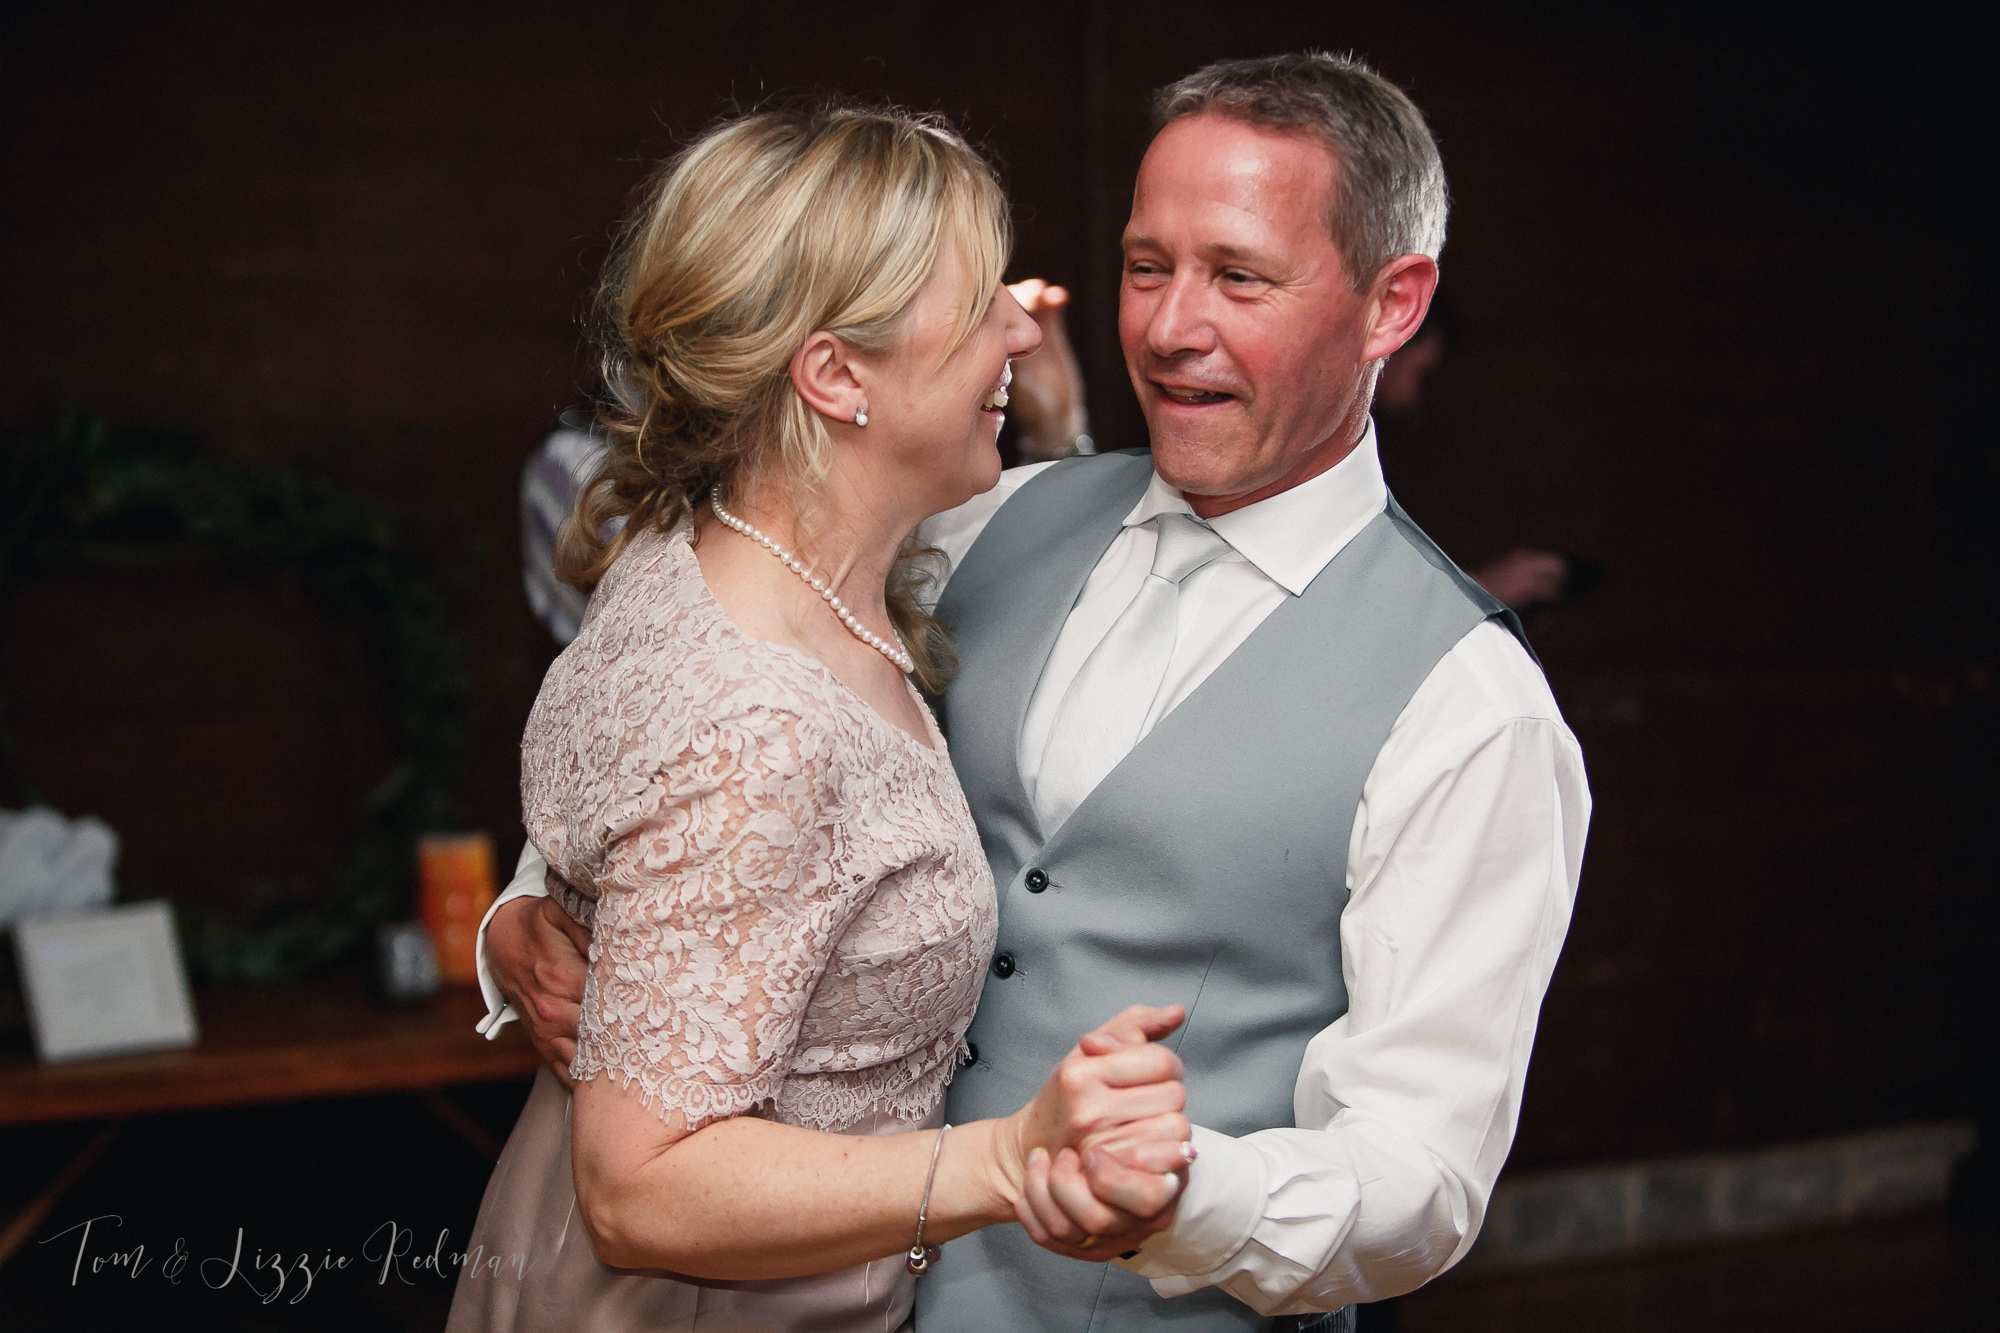 Dorset wedding photographers Tom & Lizzie Redman 074.jpg